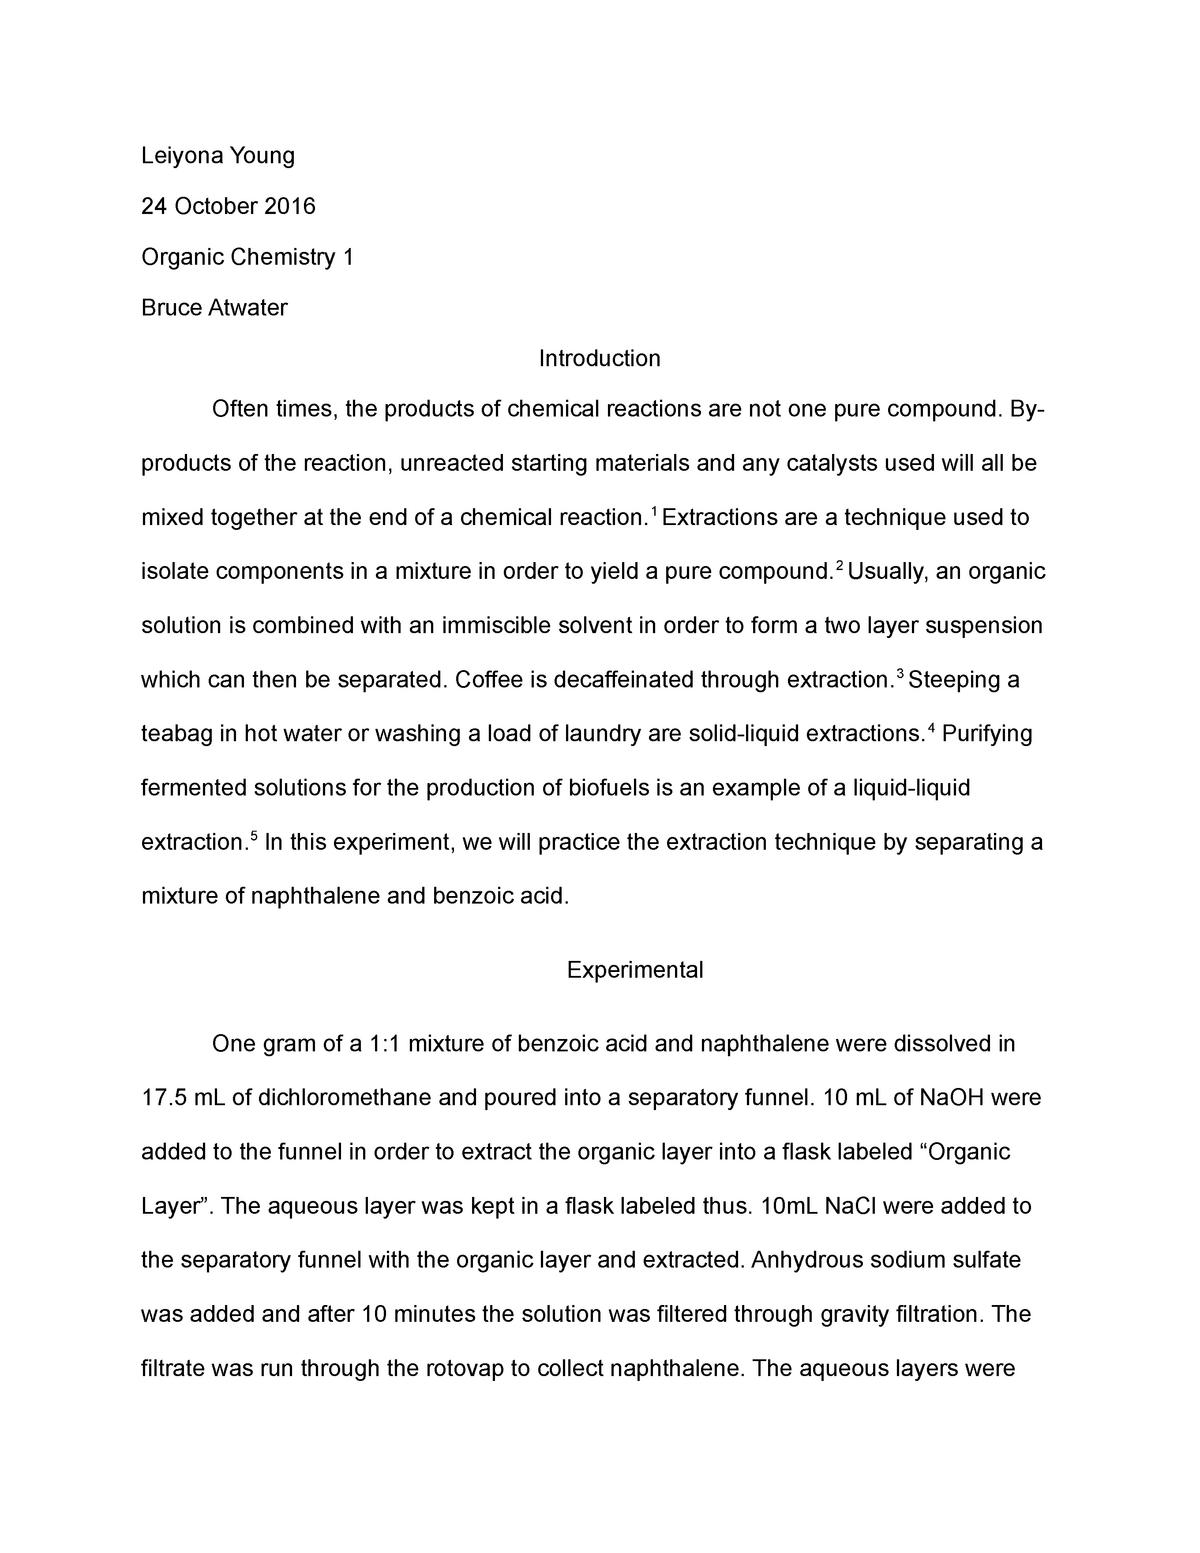 Full Lab Report 1 Extracting Naphthalene From Benzoic Acid Studocu